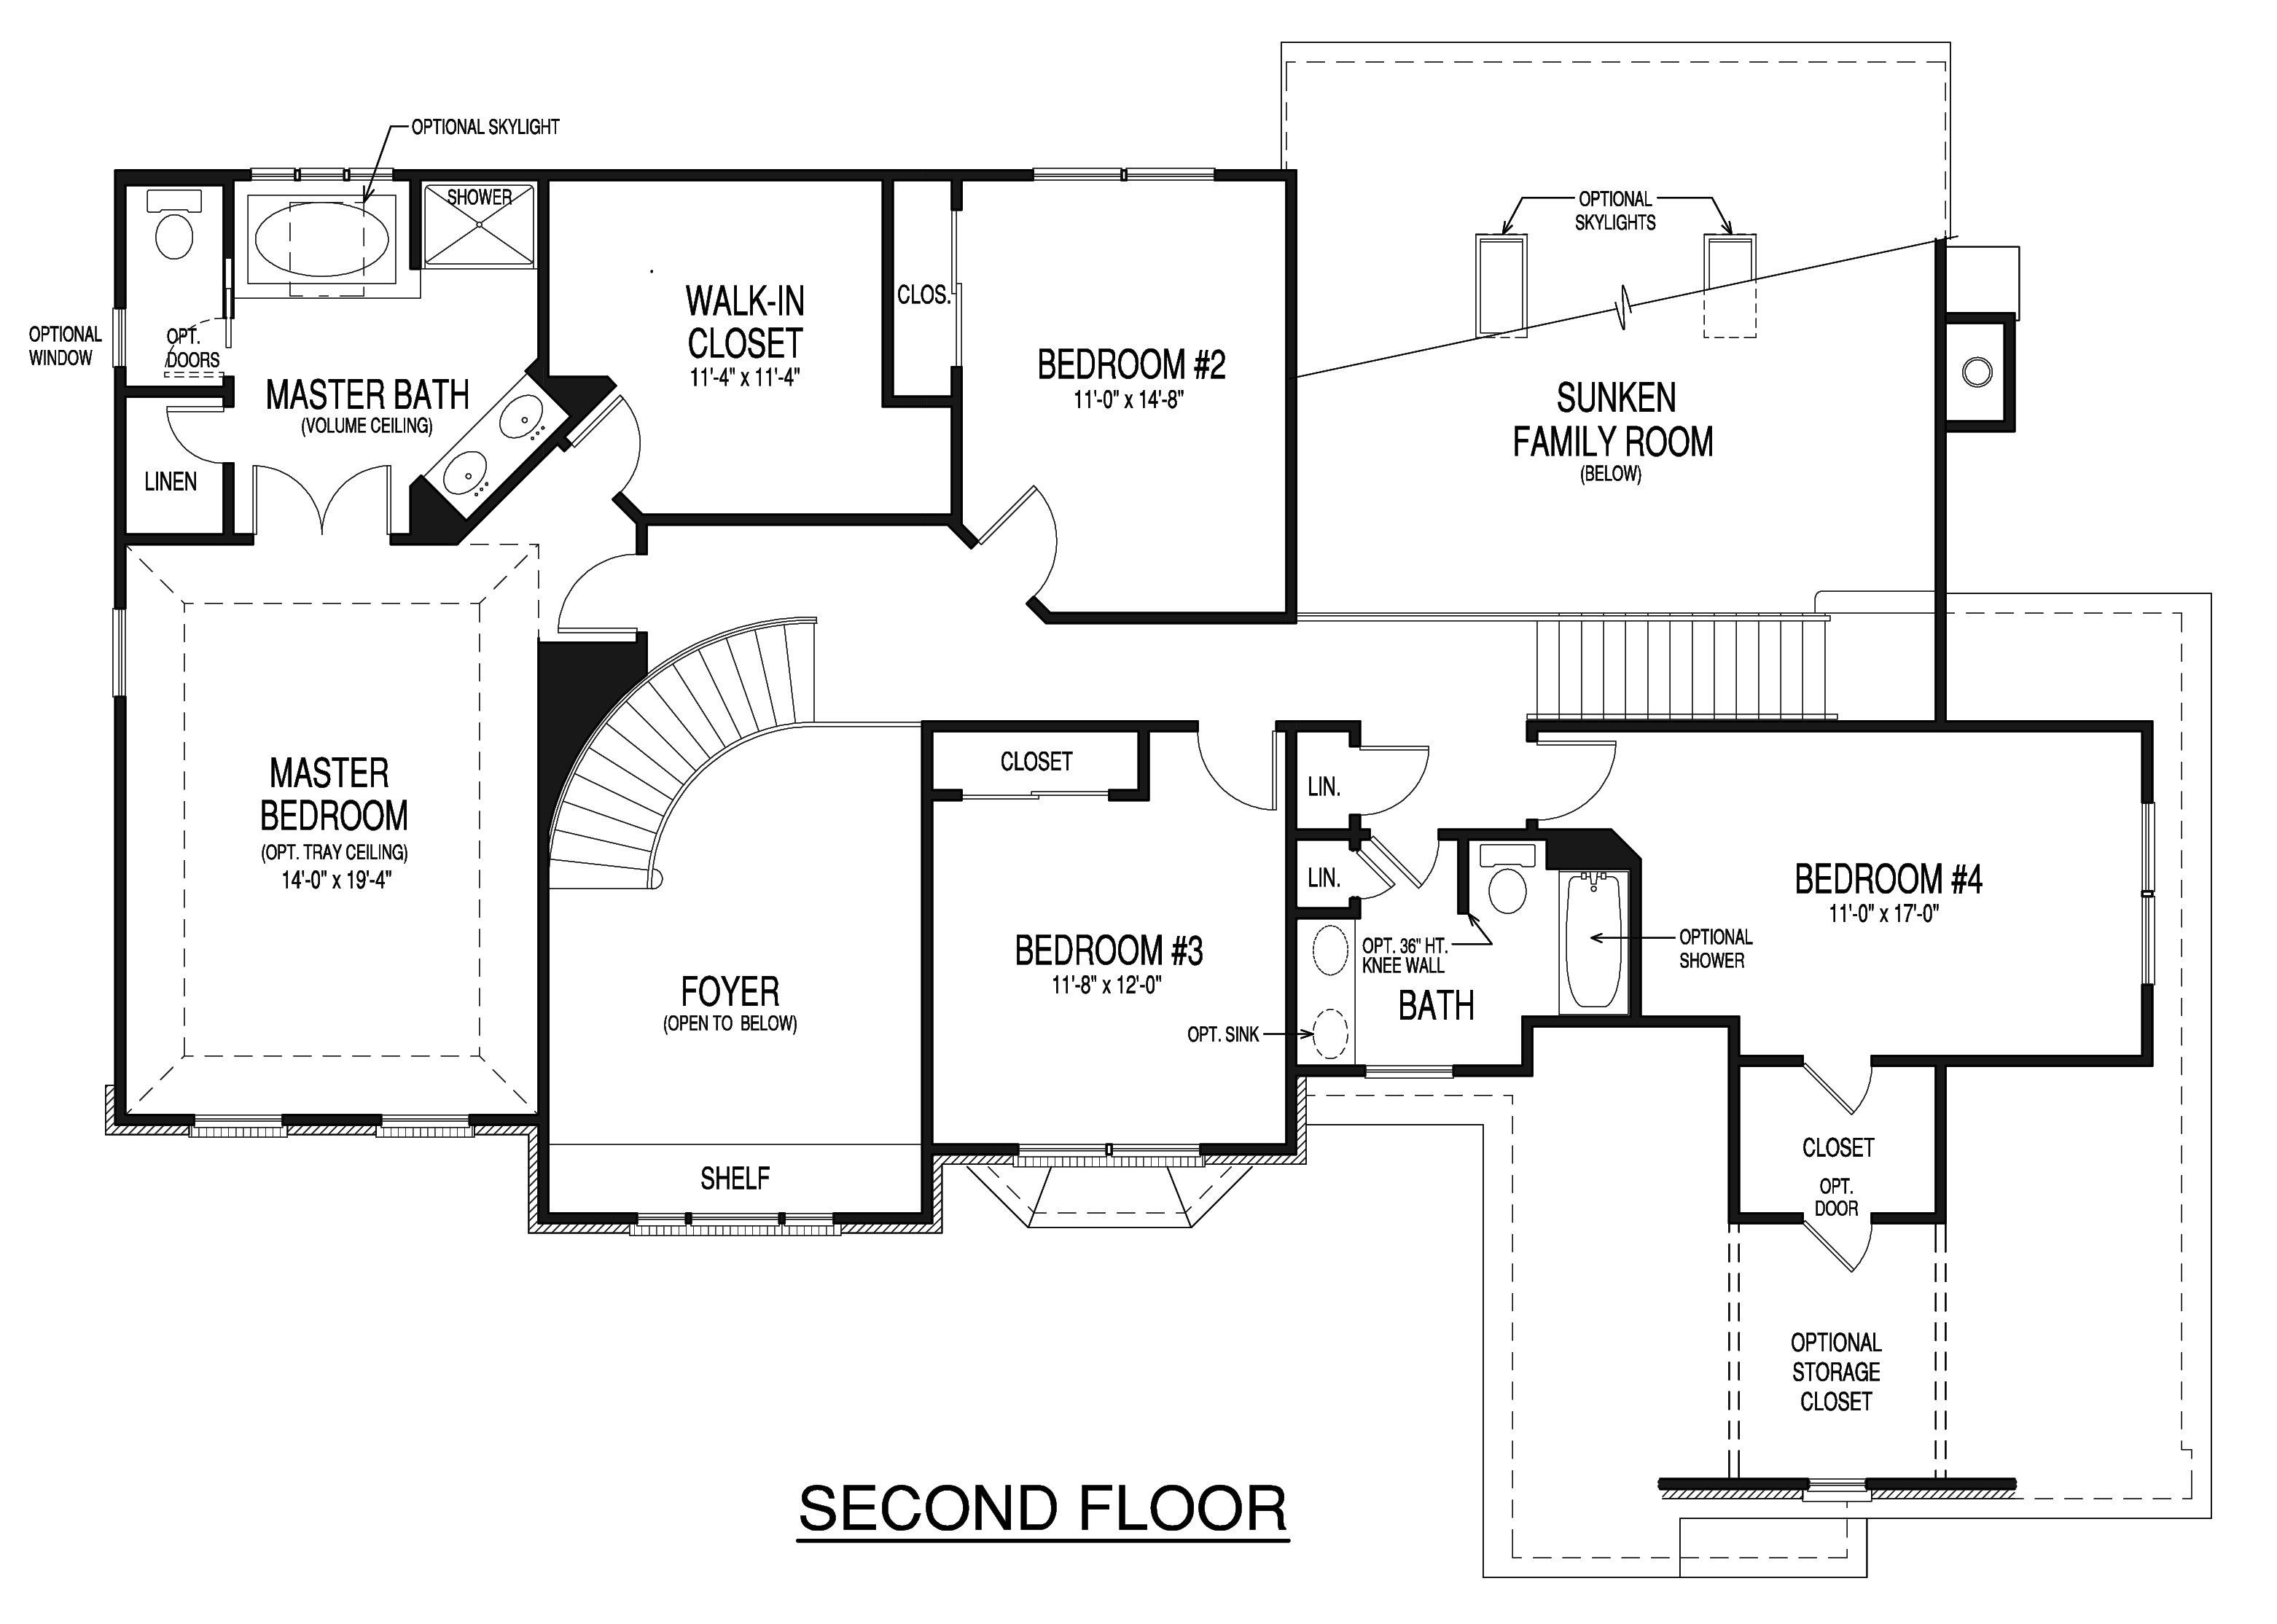 Classic Havilland Second Floor